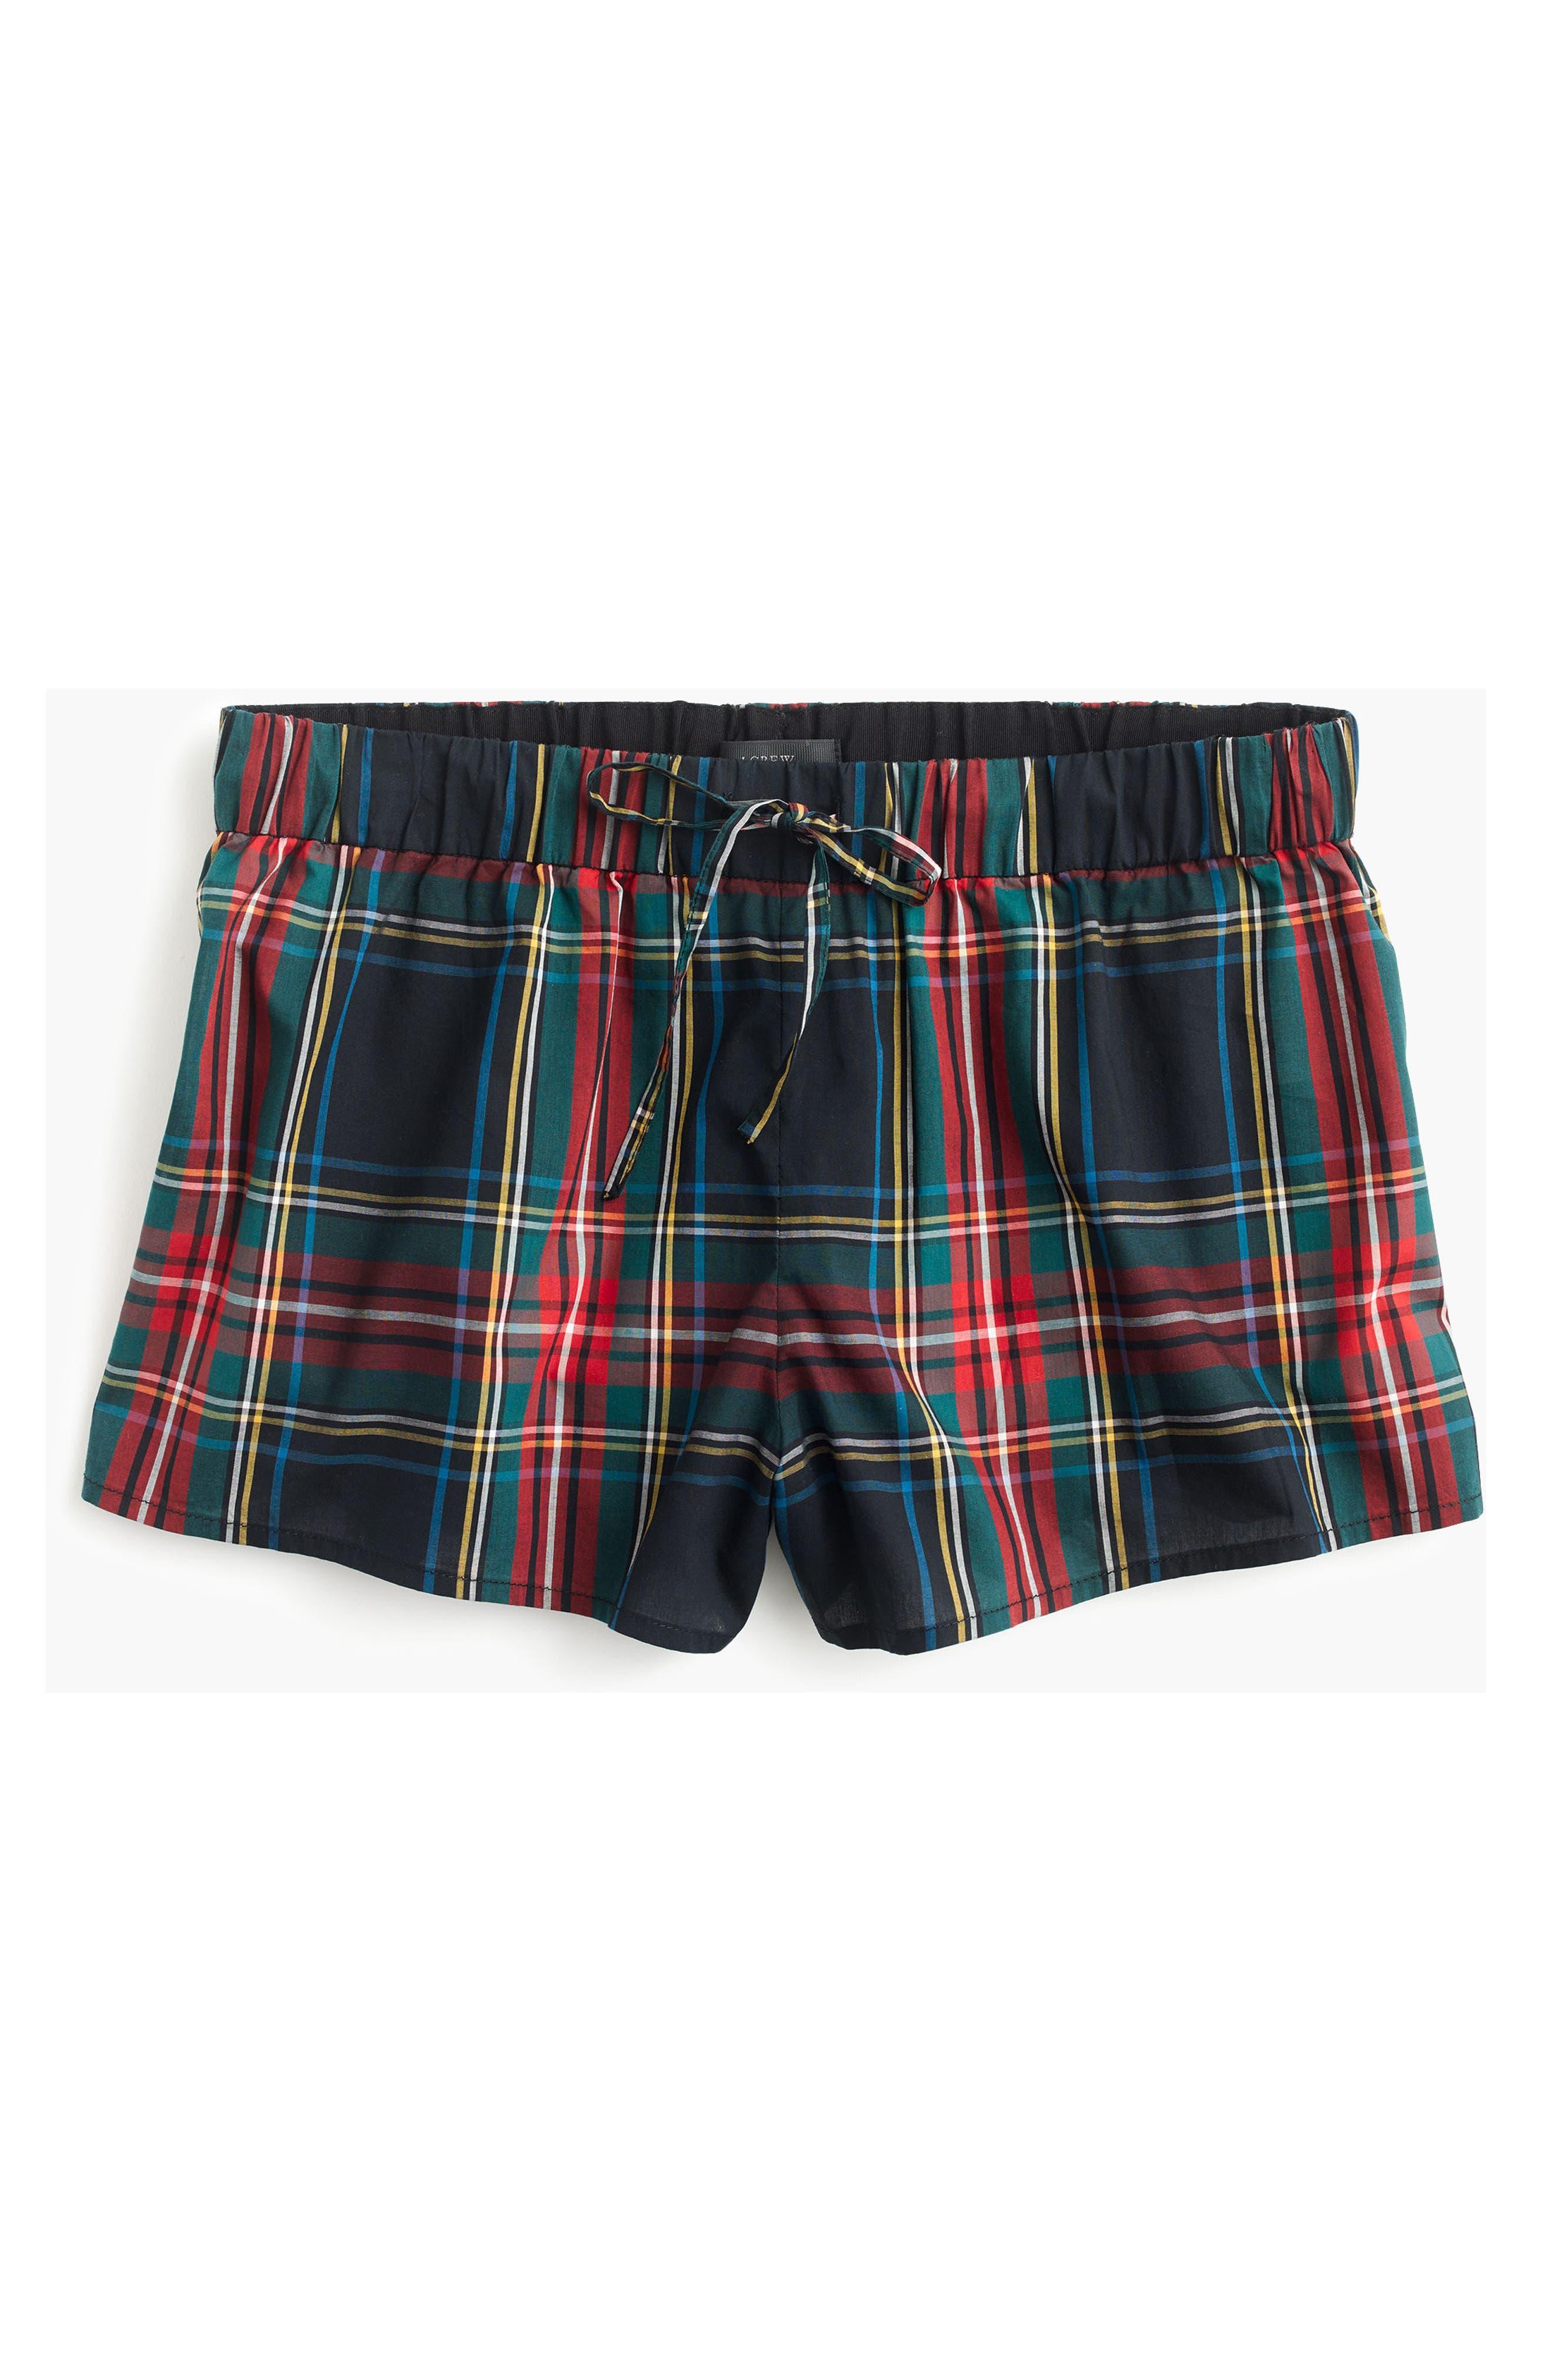 Tartan Plaid Pajama Shorts,                             Alternate thumbnail 4, color,                             600